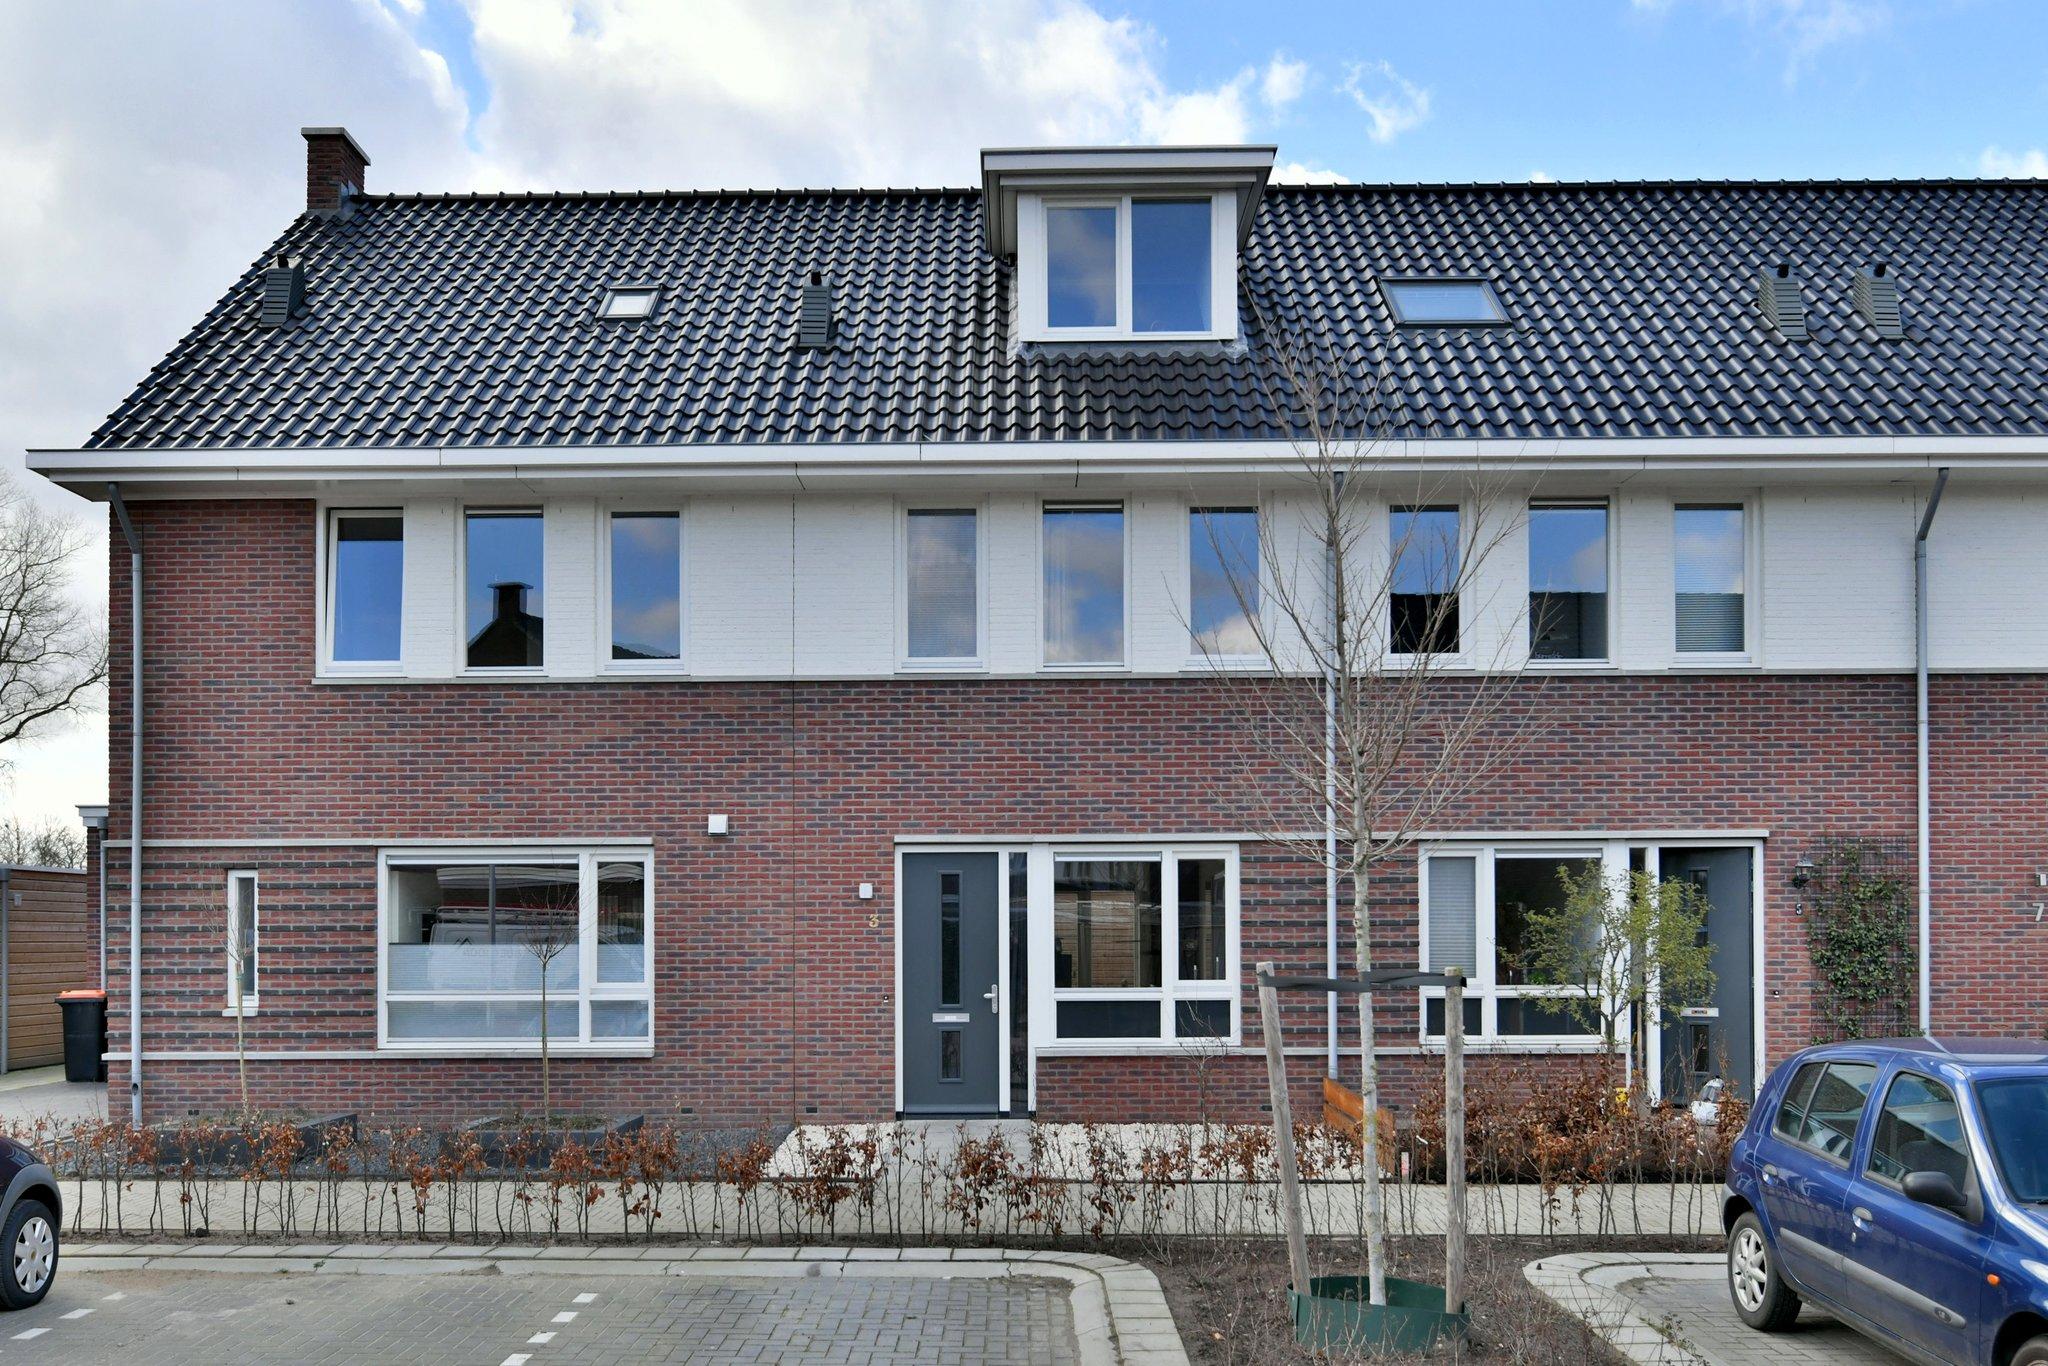 epse-marienhorst-4412137-foto-1.jpg